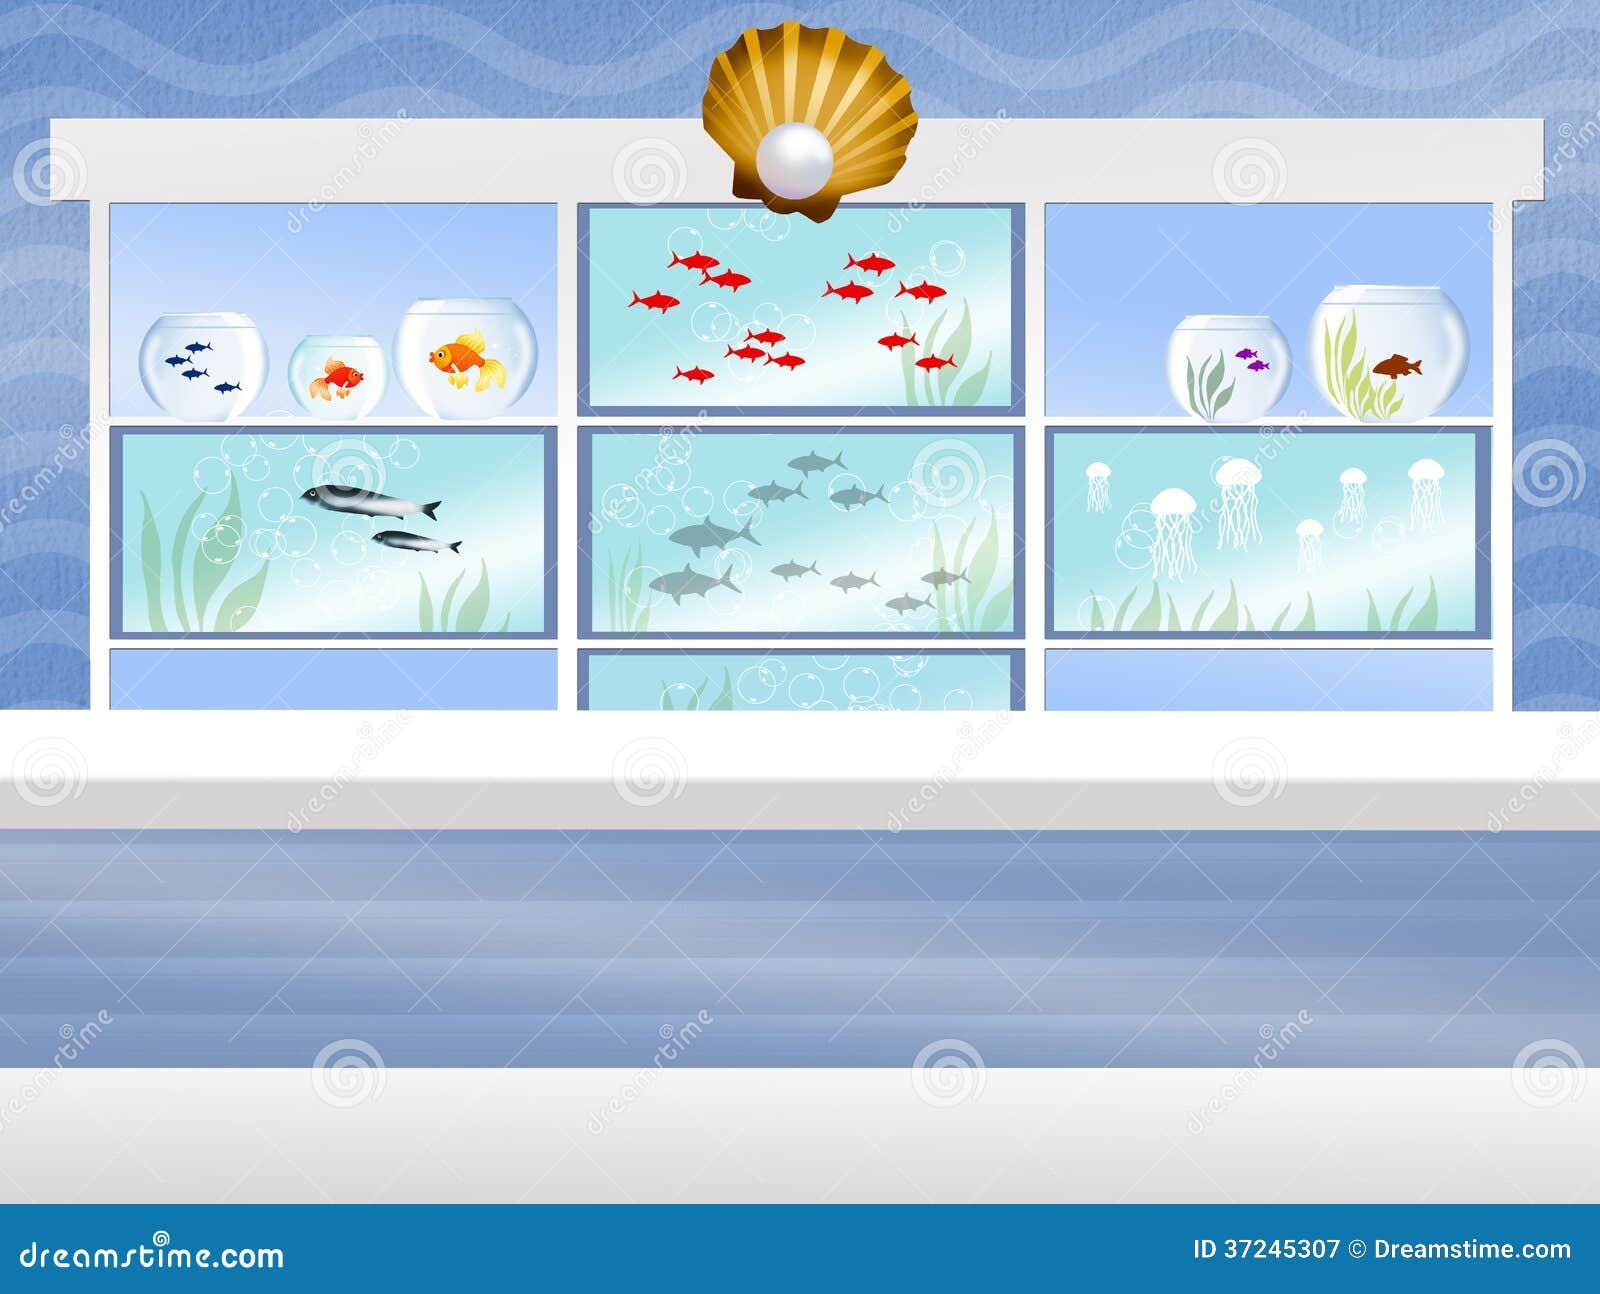 Aquarium Services Business Plan